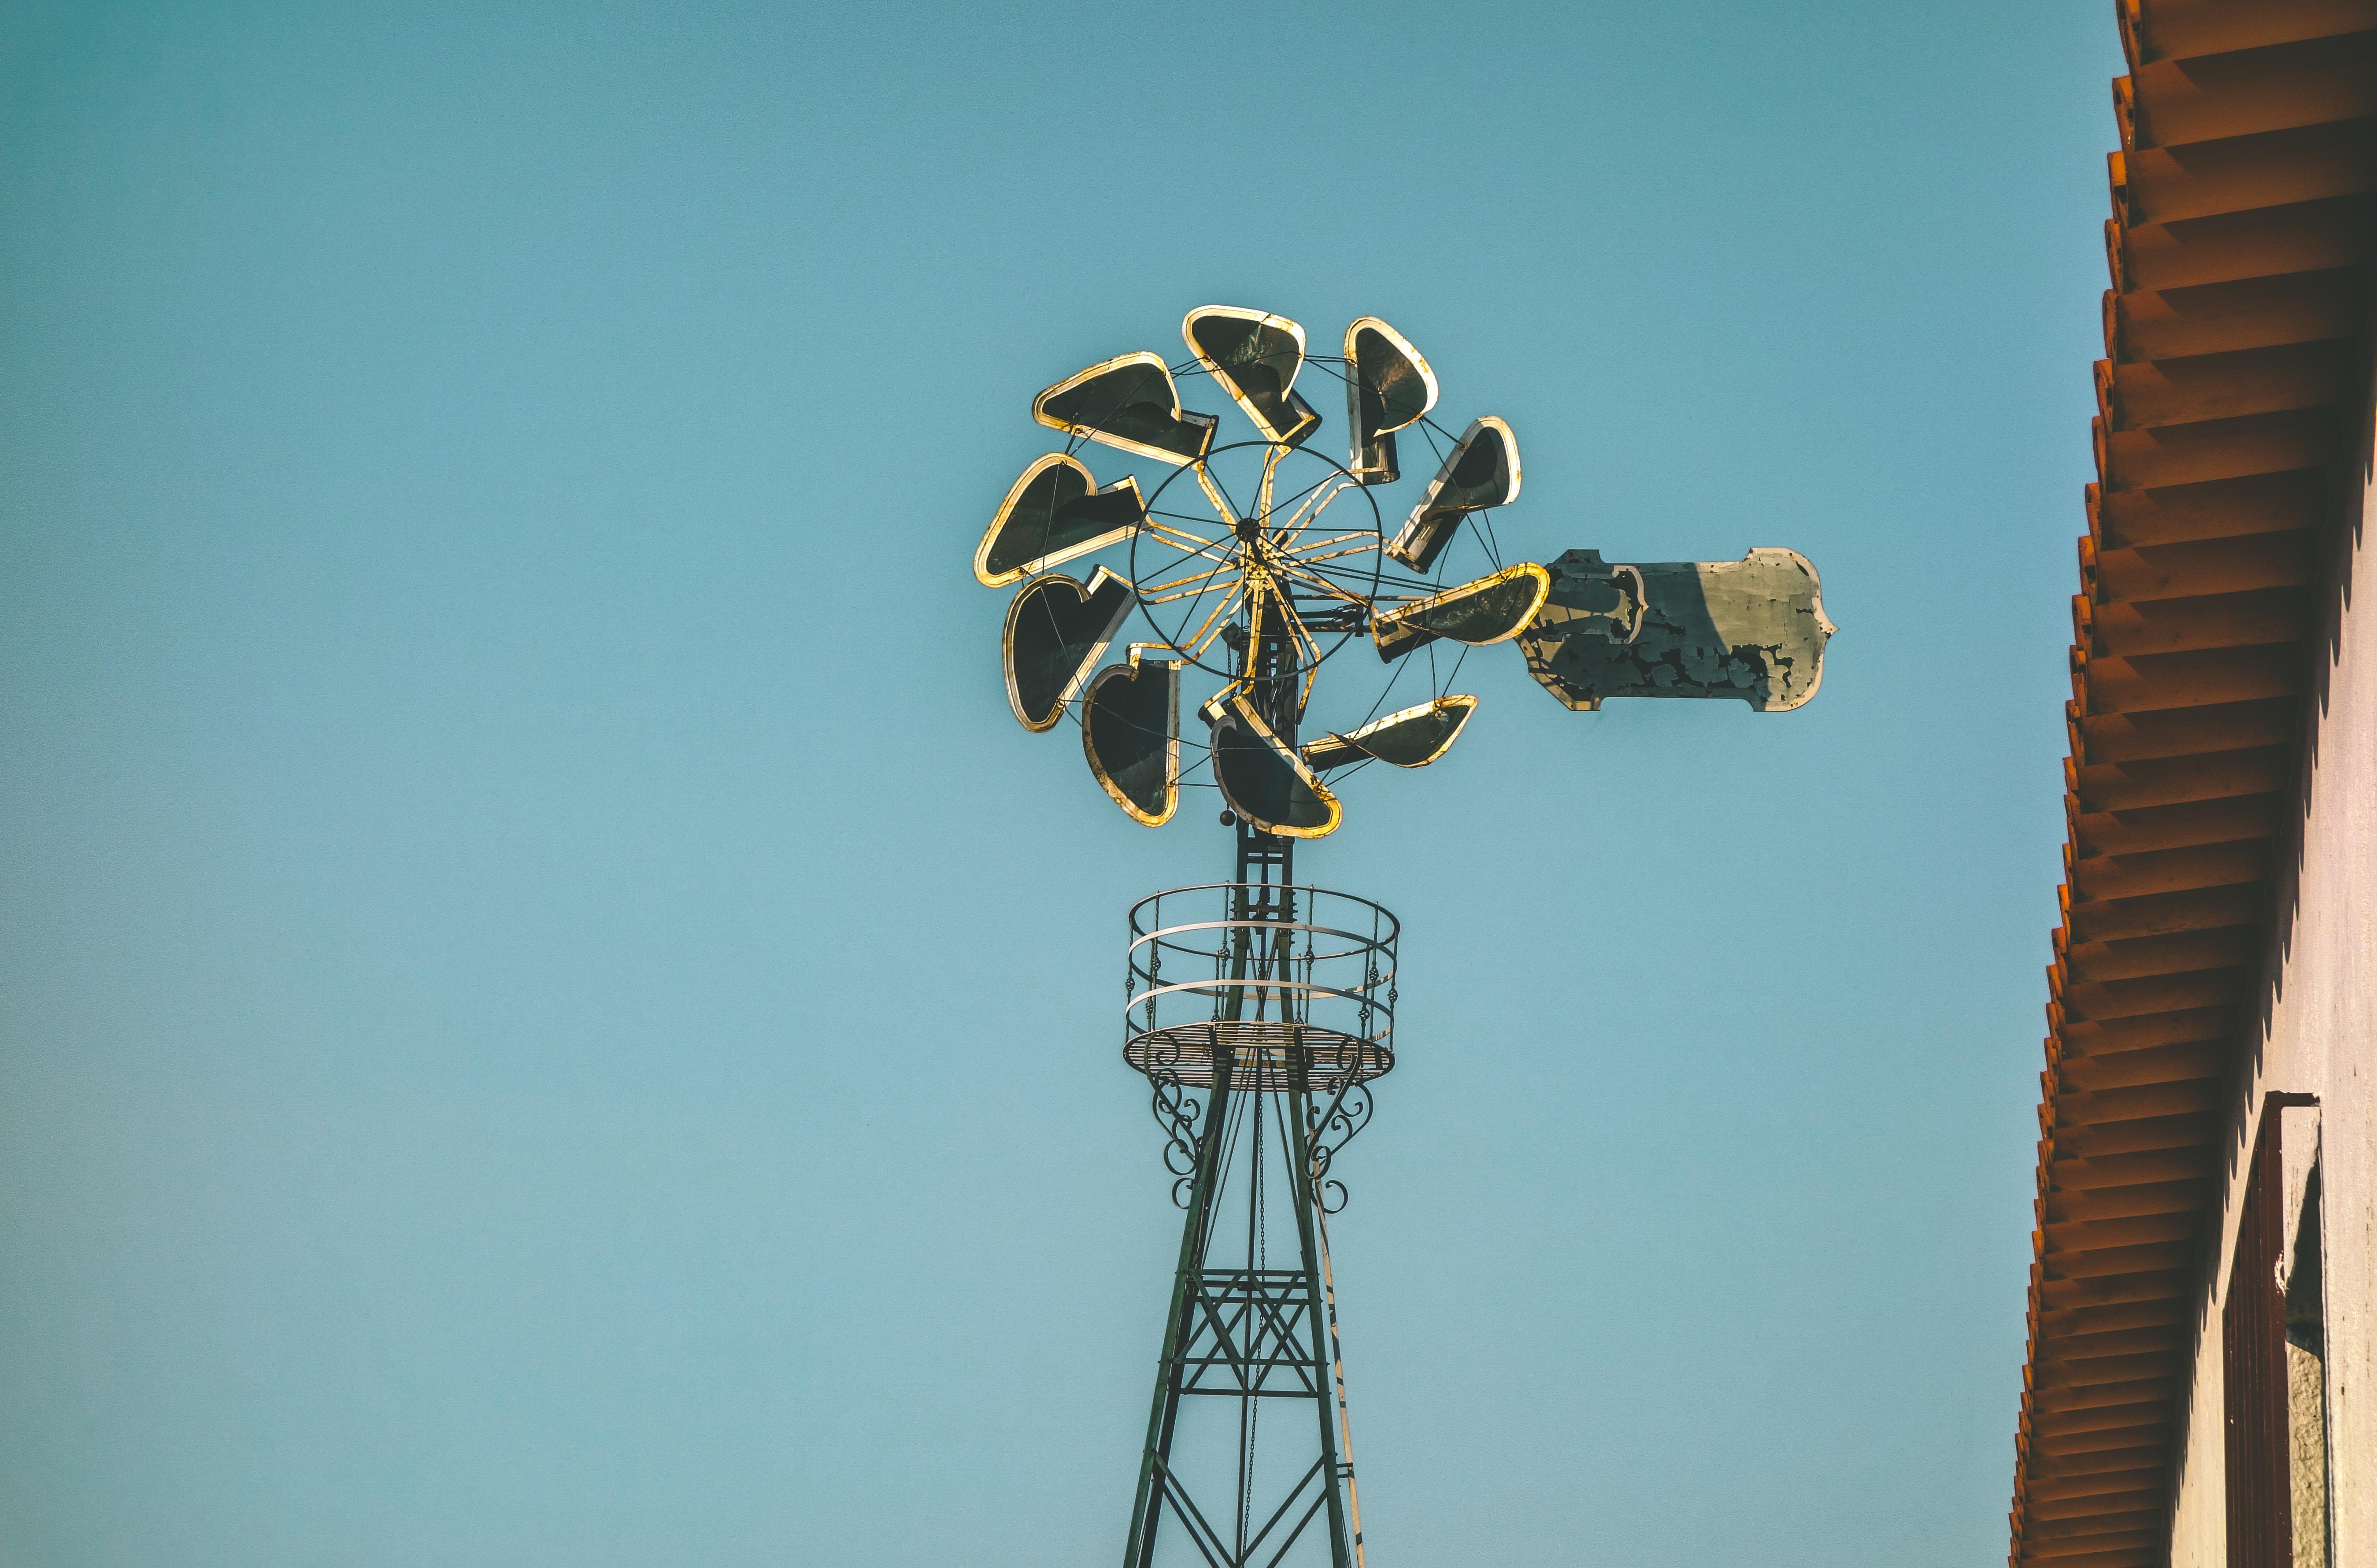 Small-scale urban windmill keeps company to eco-buildings in Blåsbälgen